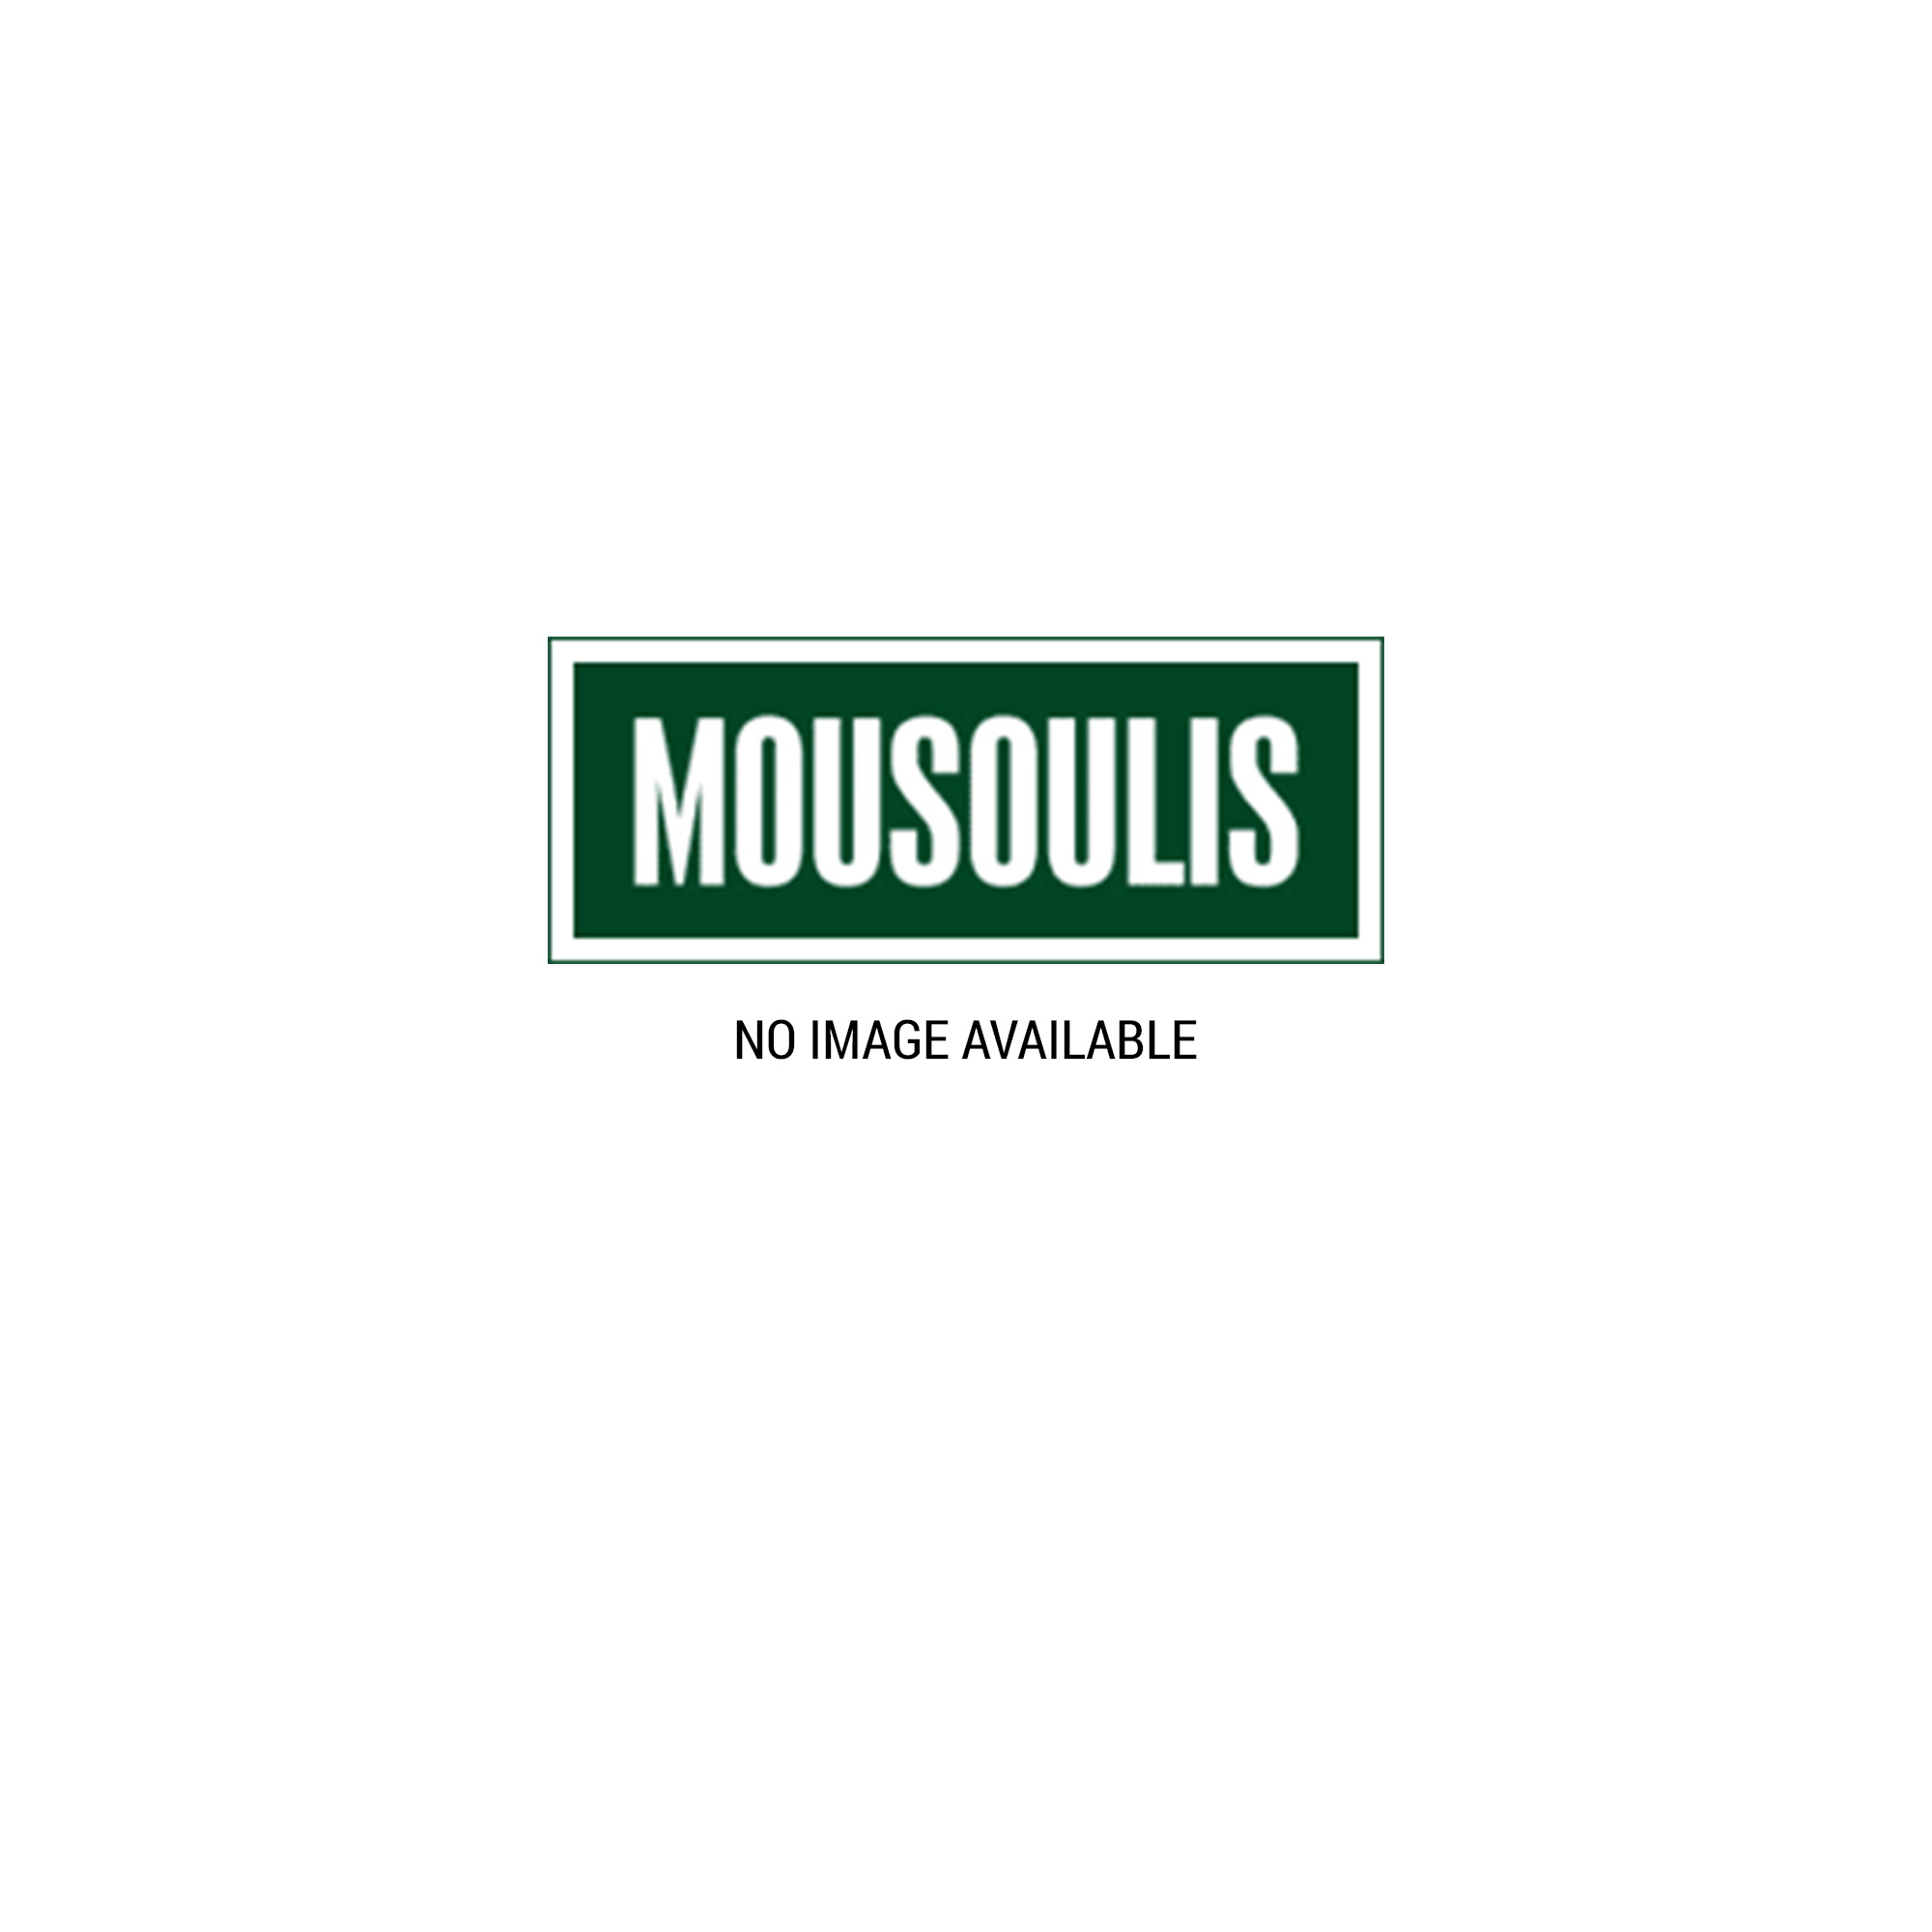 719137fbd2f Superdry | Ανδρικά Επώνυμα Ρούχα, Υποδήματα & Αξεσουάρ | Mousoulis